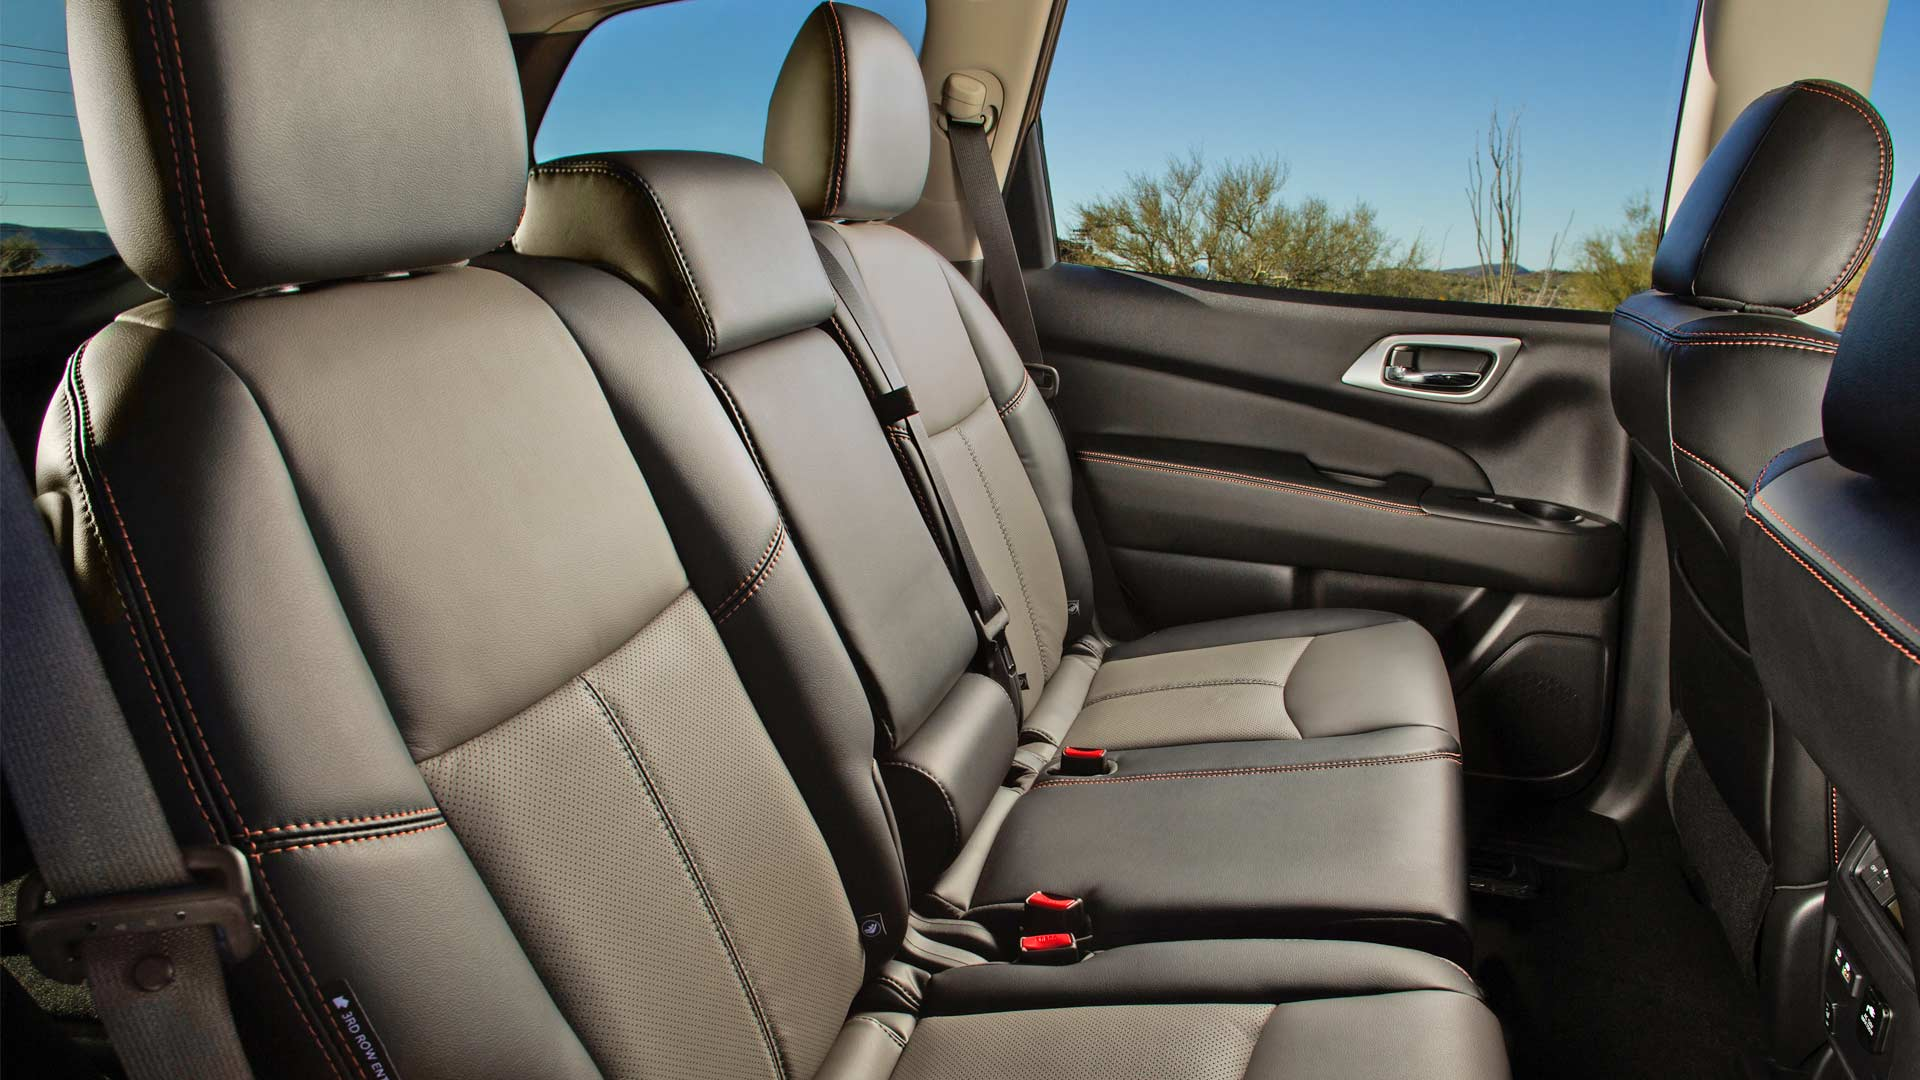 2019 Nissan Pathfinder gets Rock Creek Edition - Autodevot